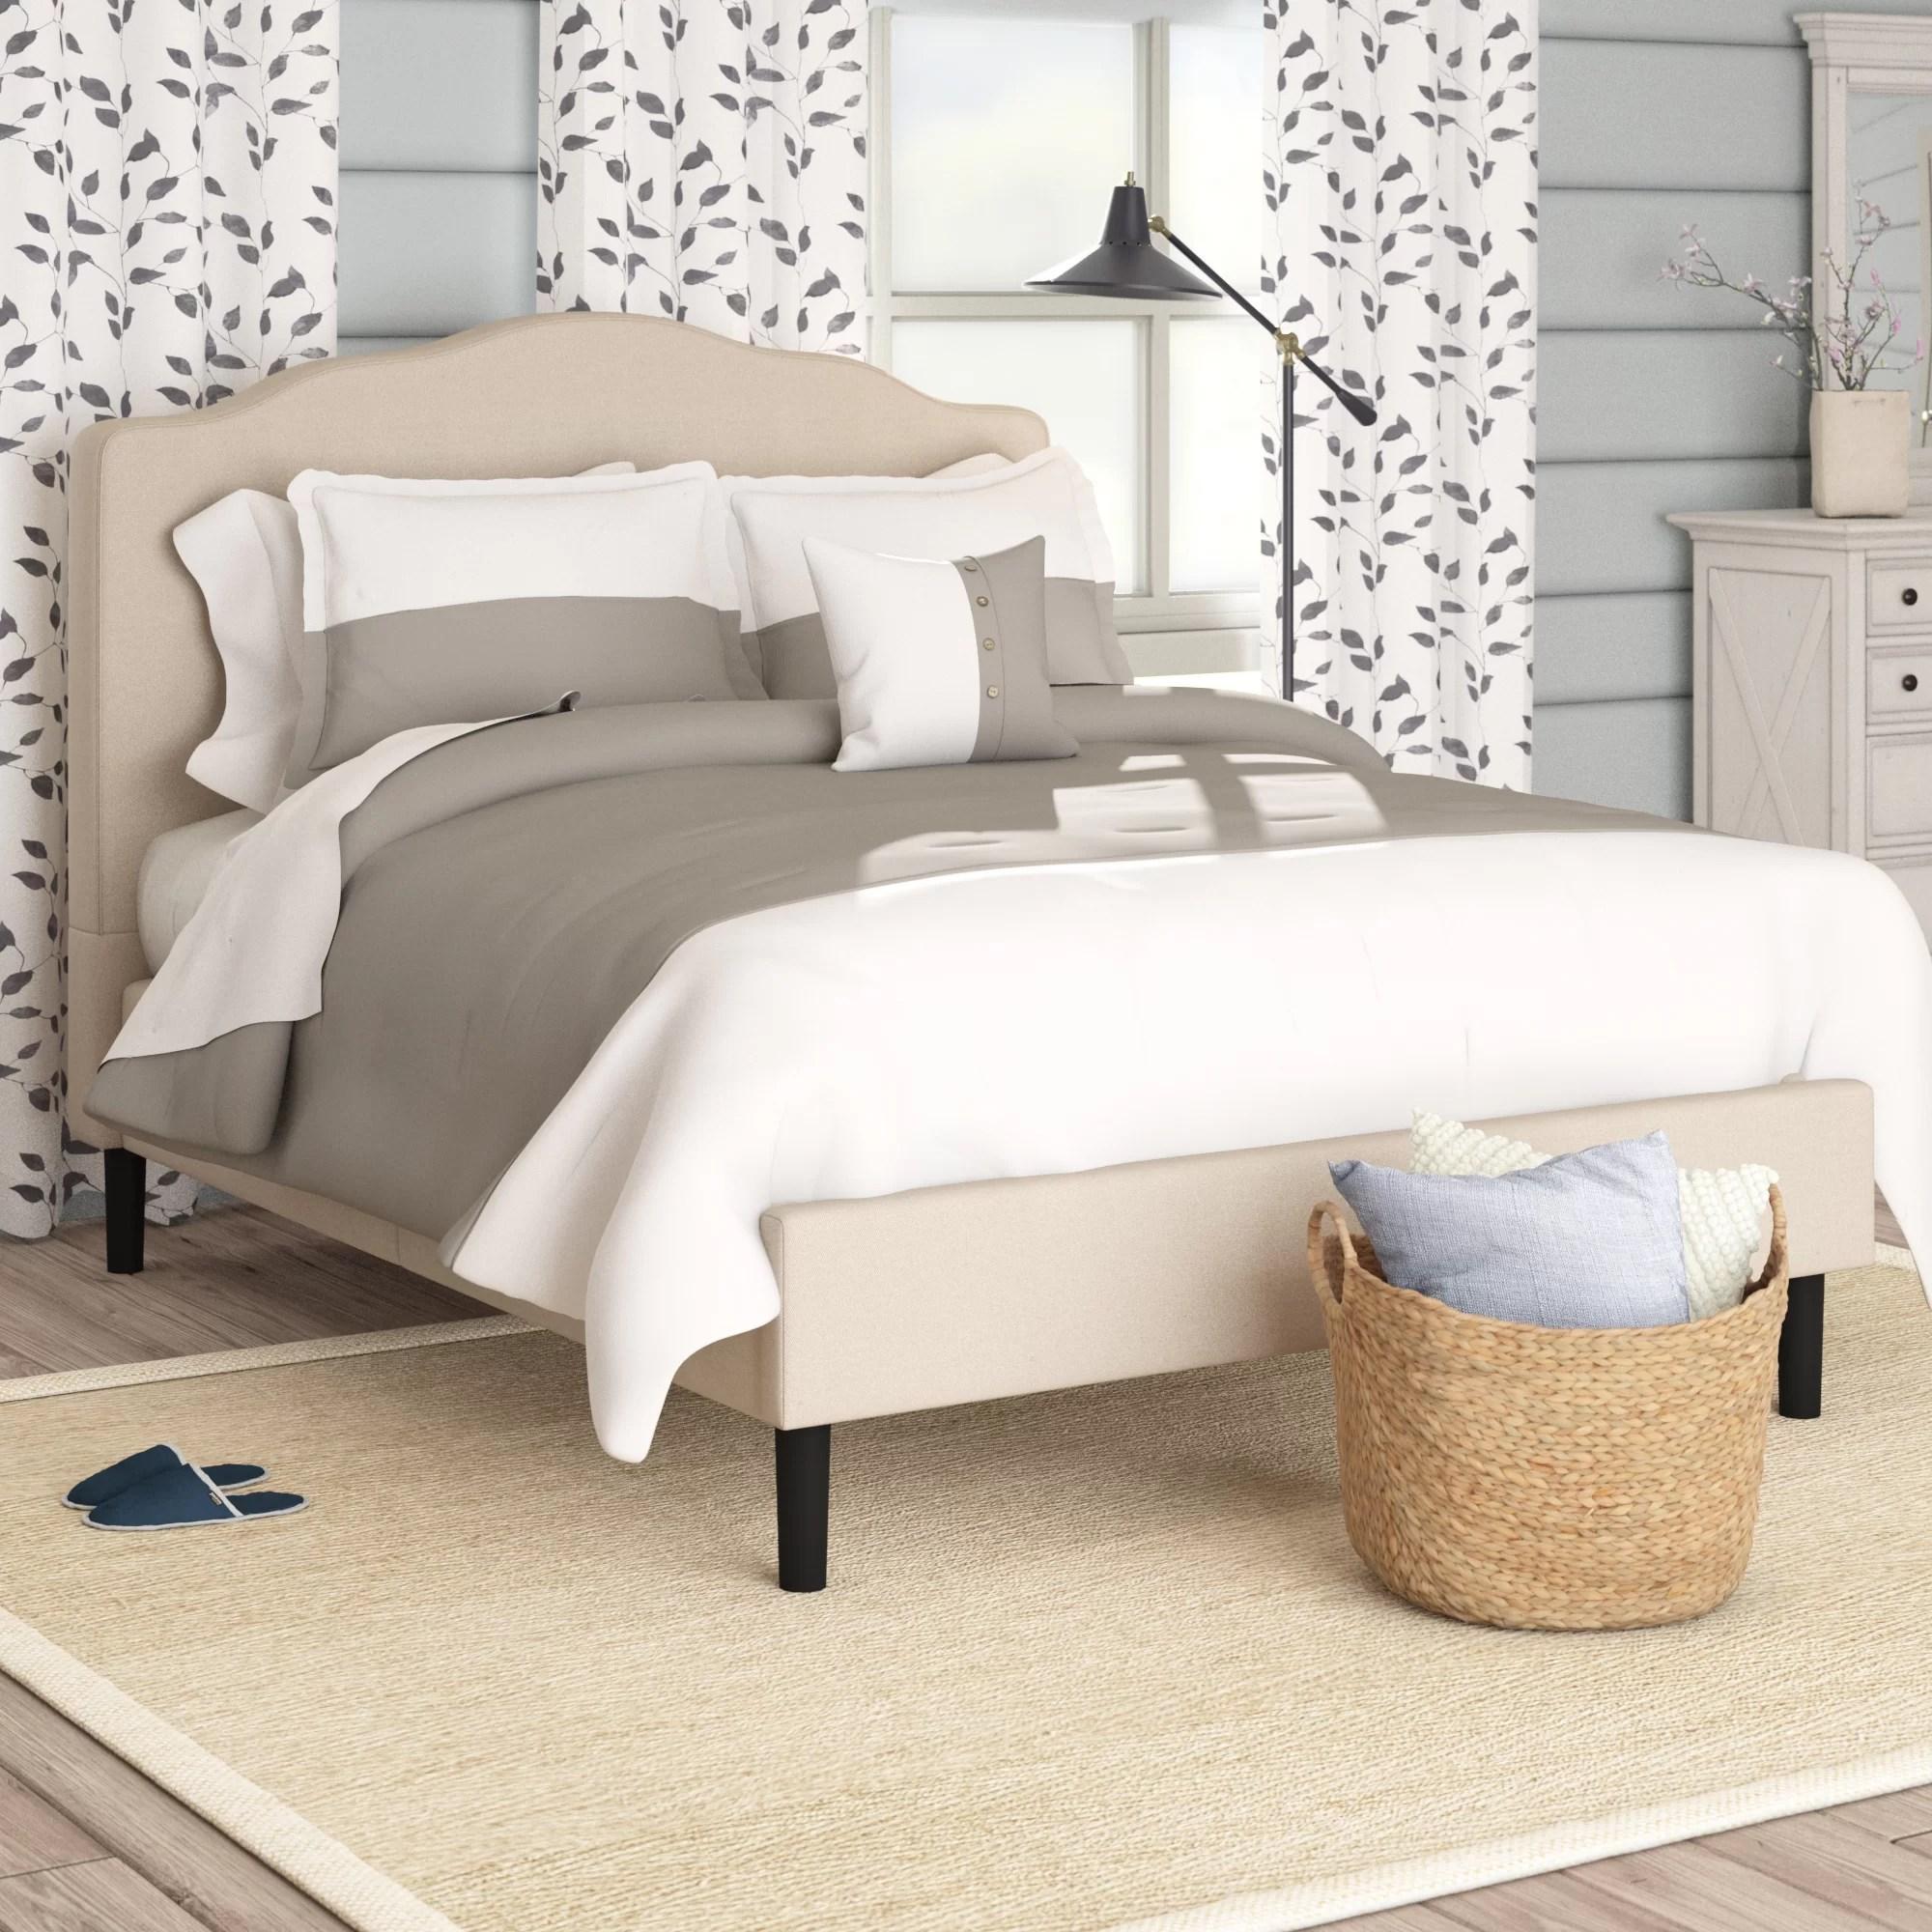 Laurel Foundry Modern Farmhouse Hoopeston Upholstered Platform Bed Reviews